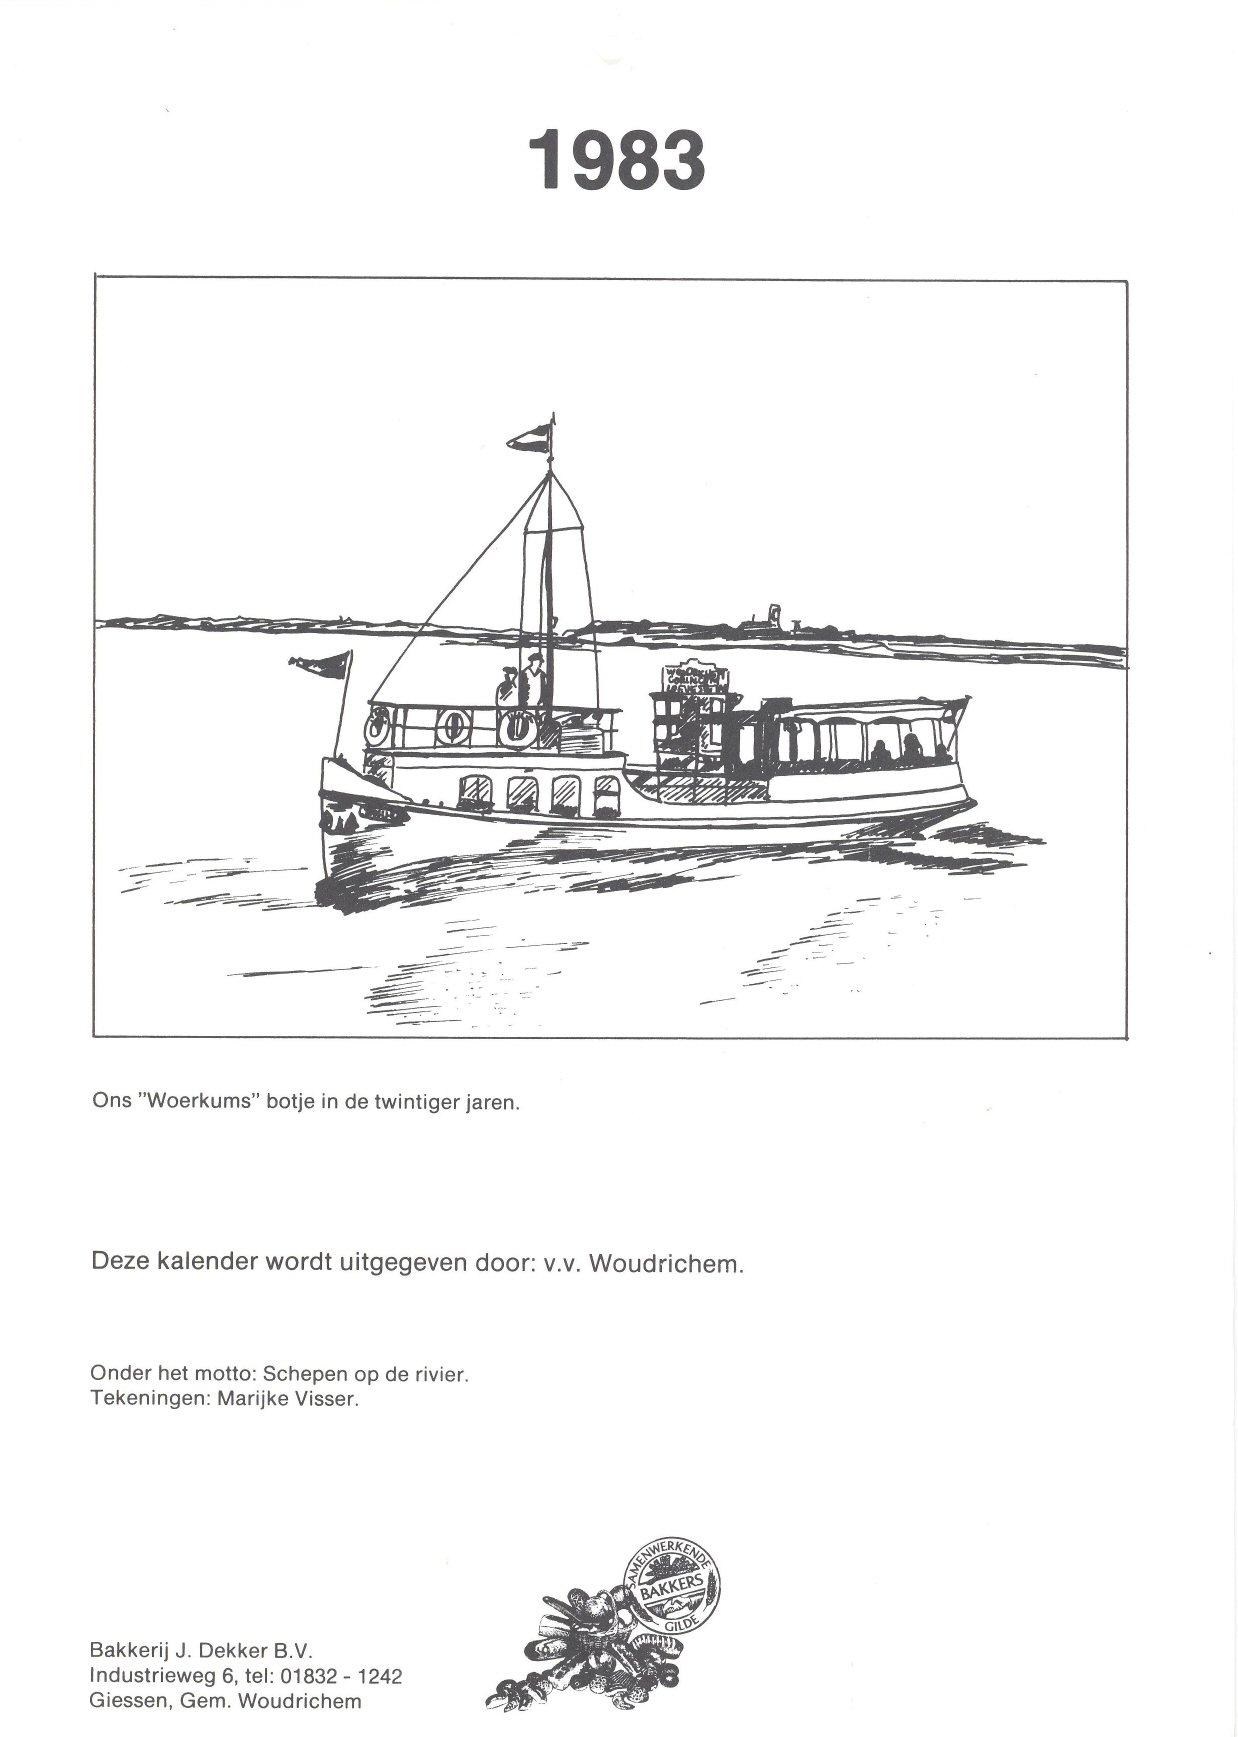 KALE-012a Kalender 1983